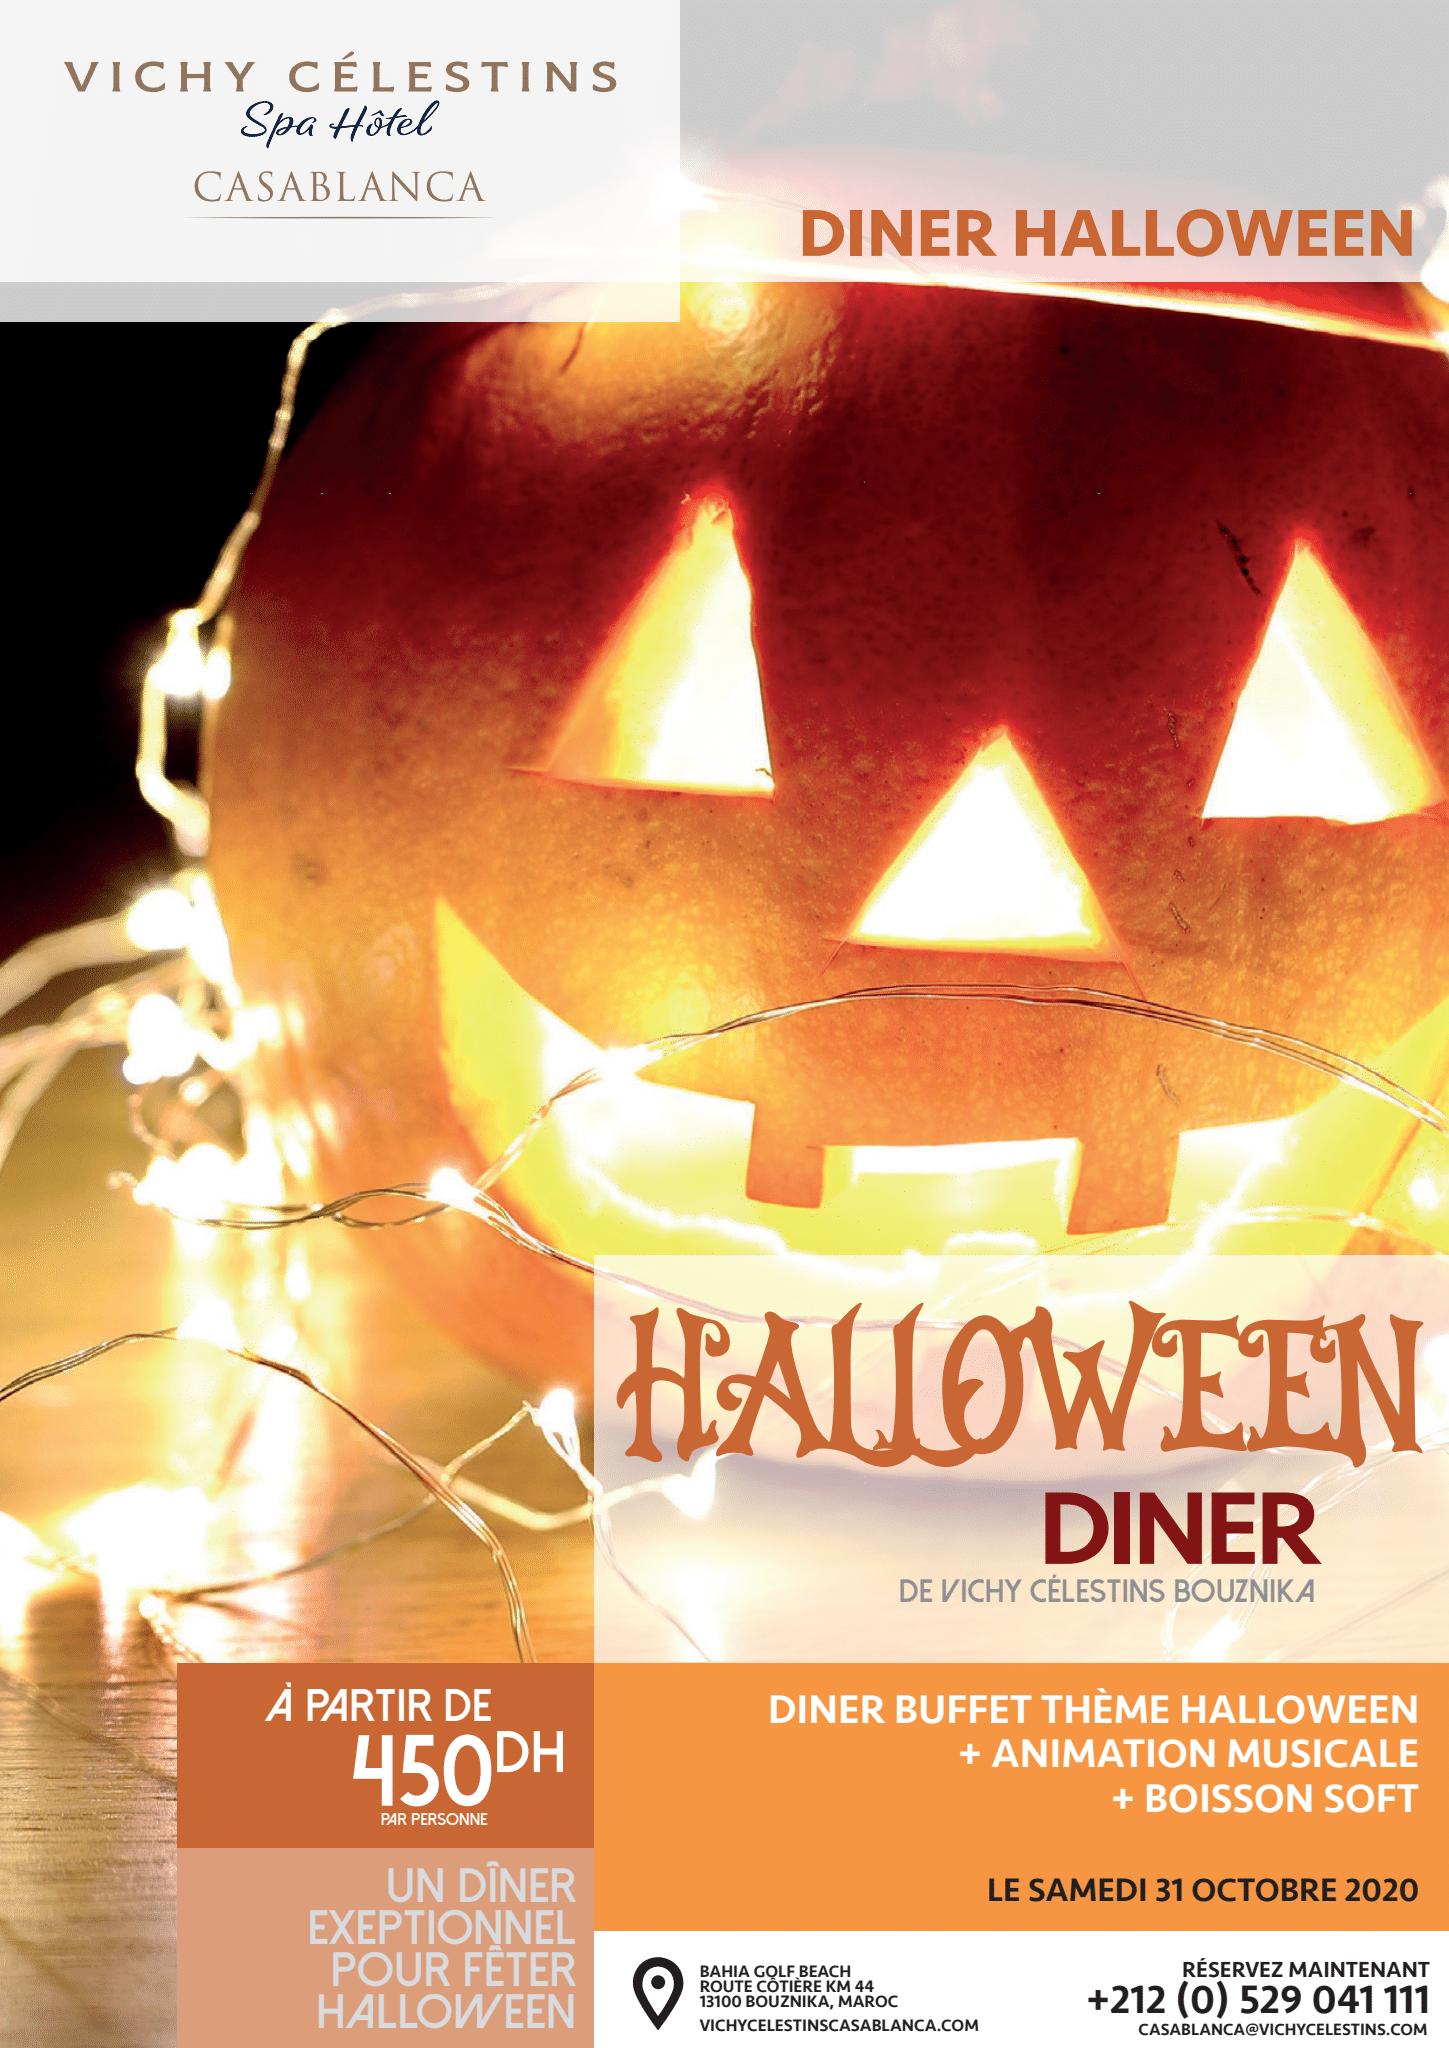 Vichy Célestins – Campagne diner du Halloween